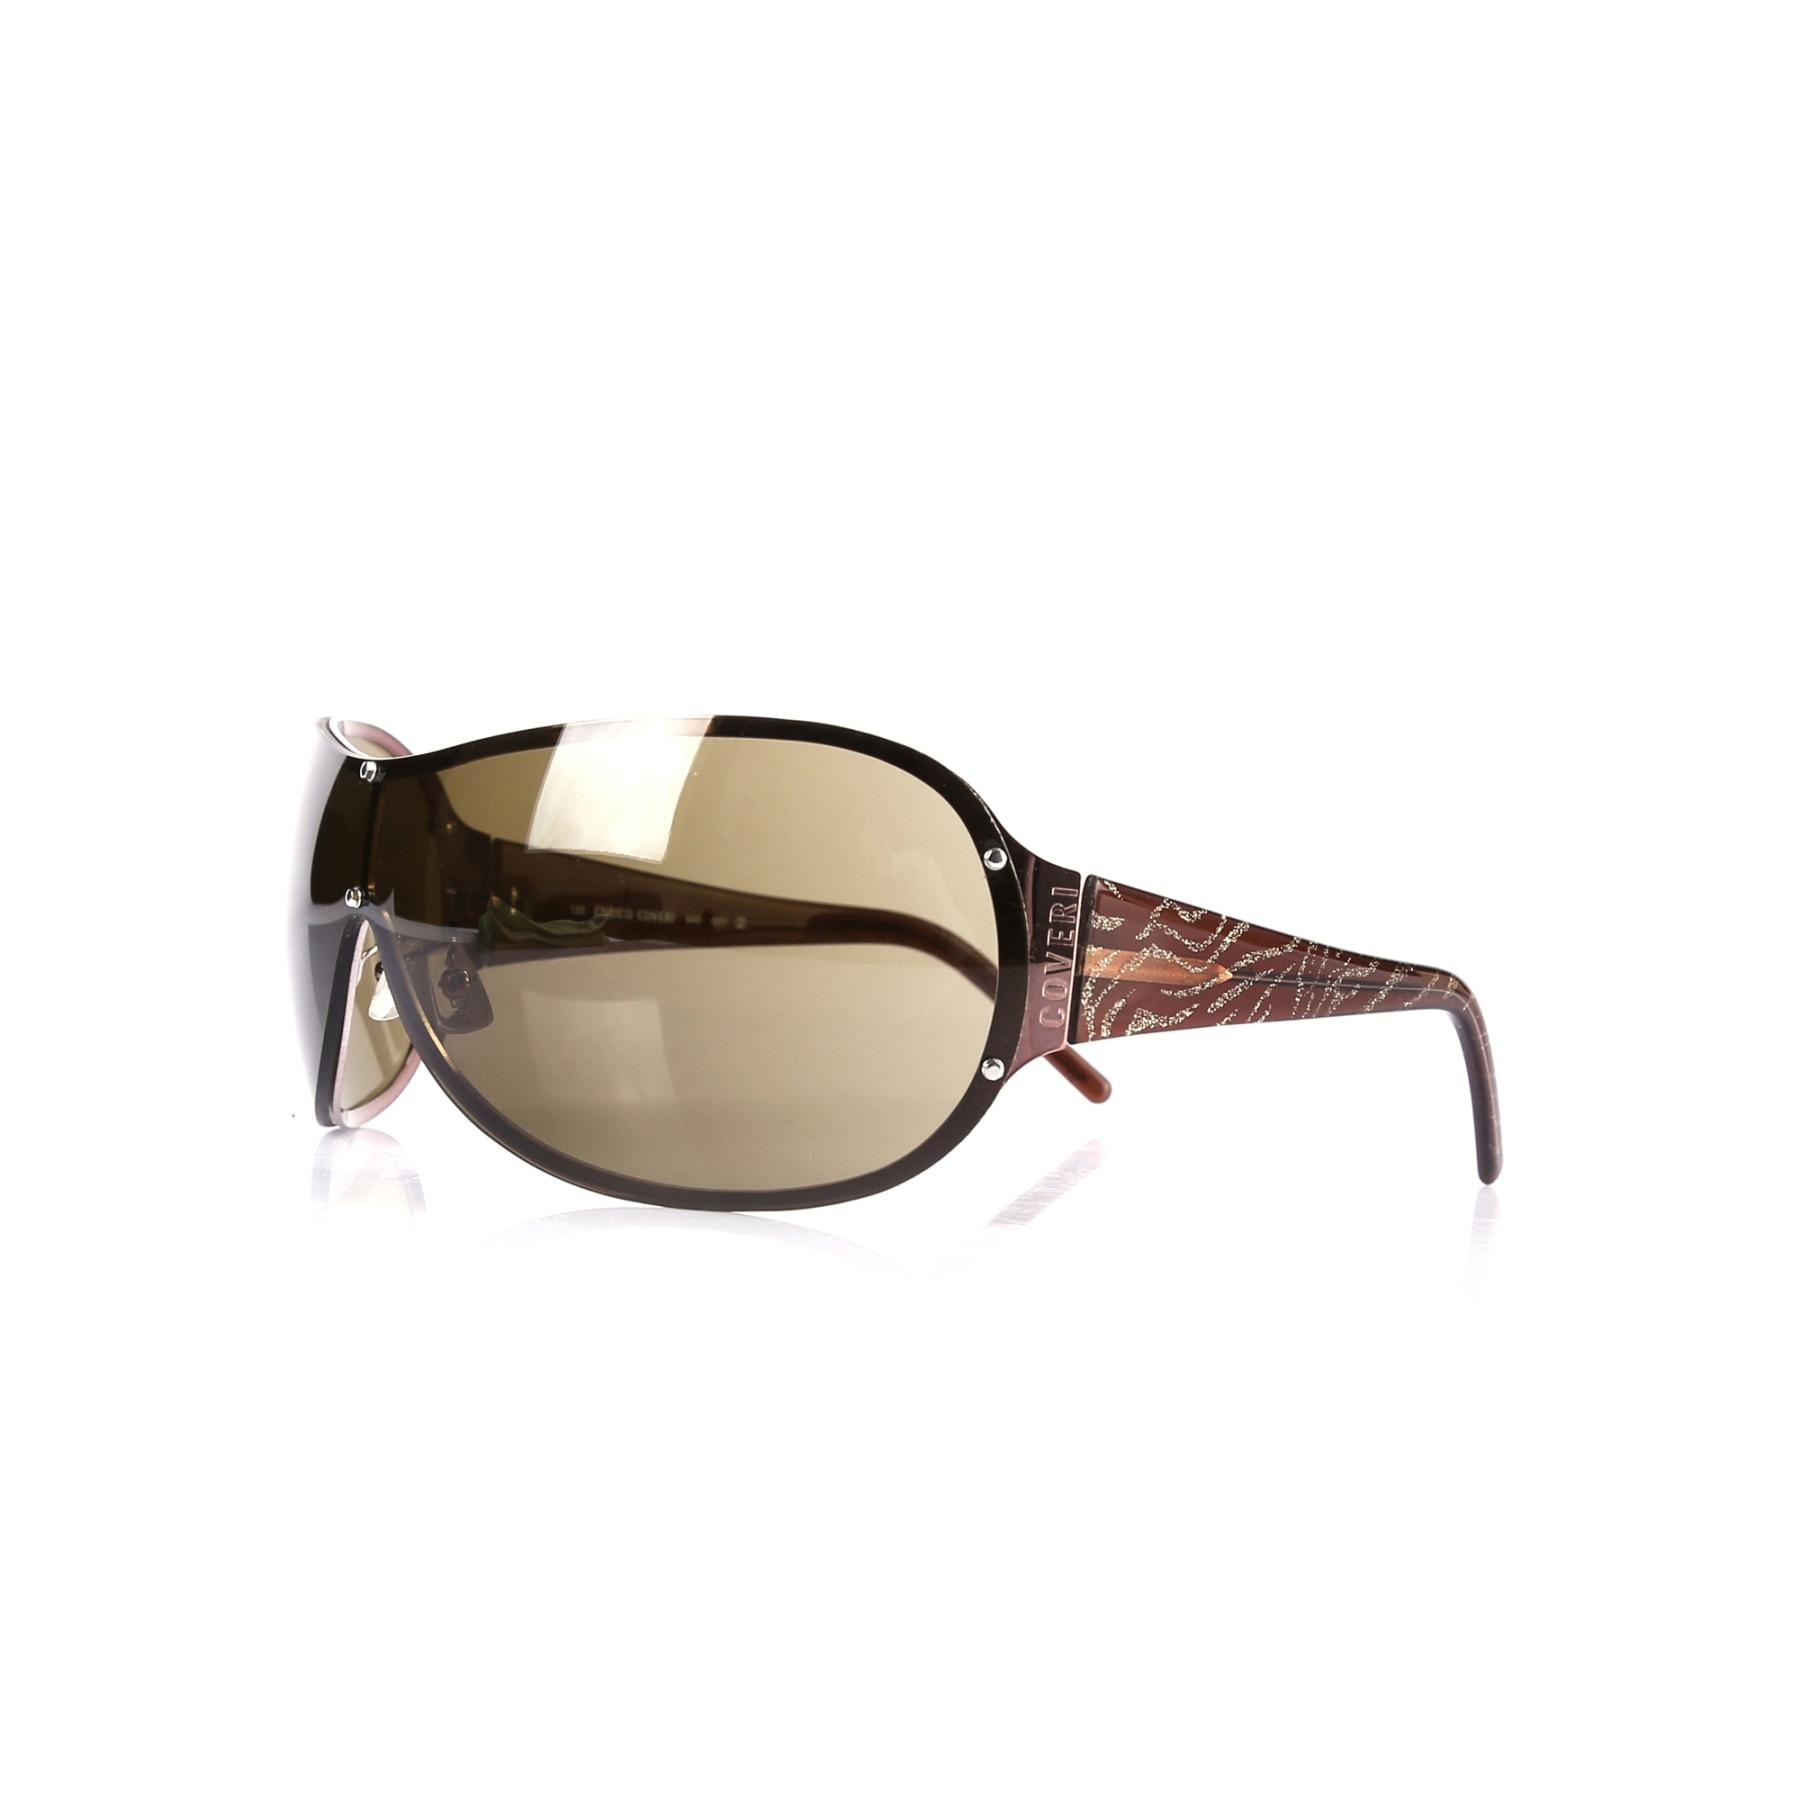 Women's sunglasses ec 940 001 metal copper organic rectangle rectangle 135-125 enrico coveri фото